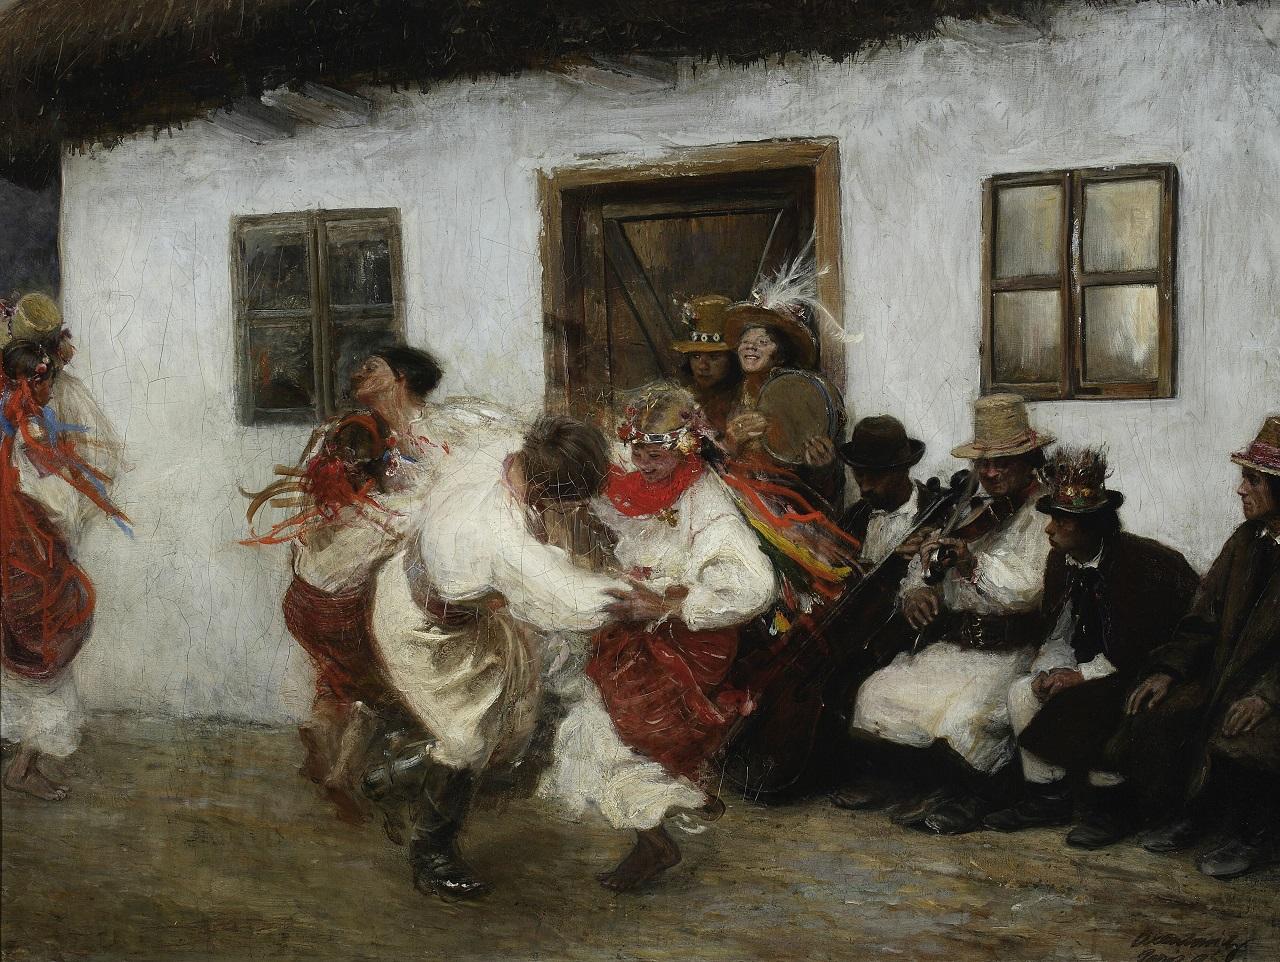 Theodor Axentowicz. Ukrainischer Volkstanz. 1895. Öl / Leinwand. 85 x 112cm